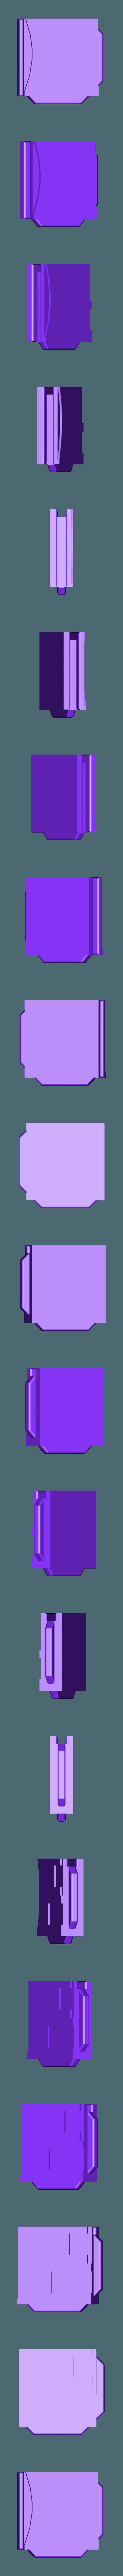 Piece - Part 18.stl Download free STL file Taquin CULTS / Sliding Puzzle • 3D print model, Valelab3D